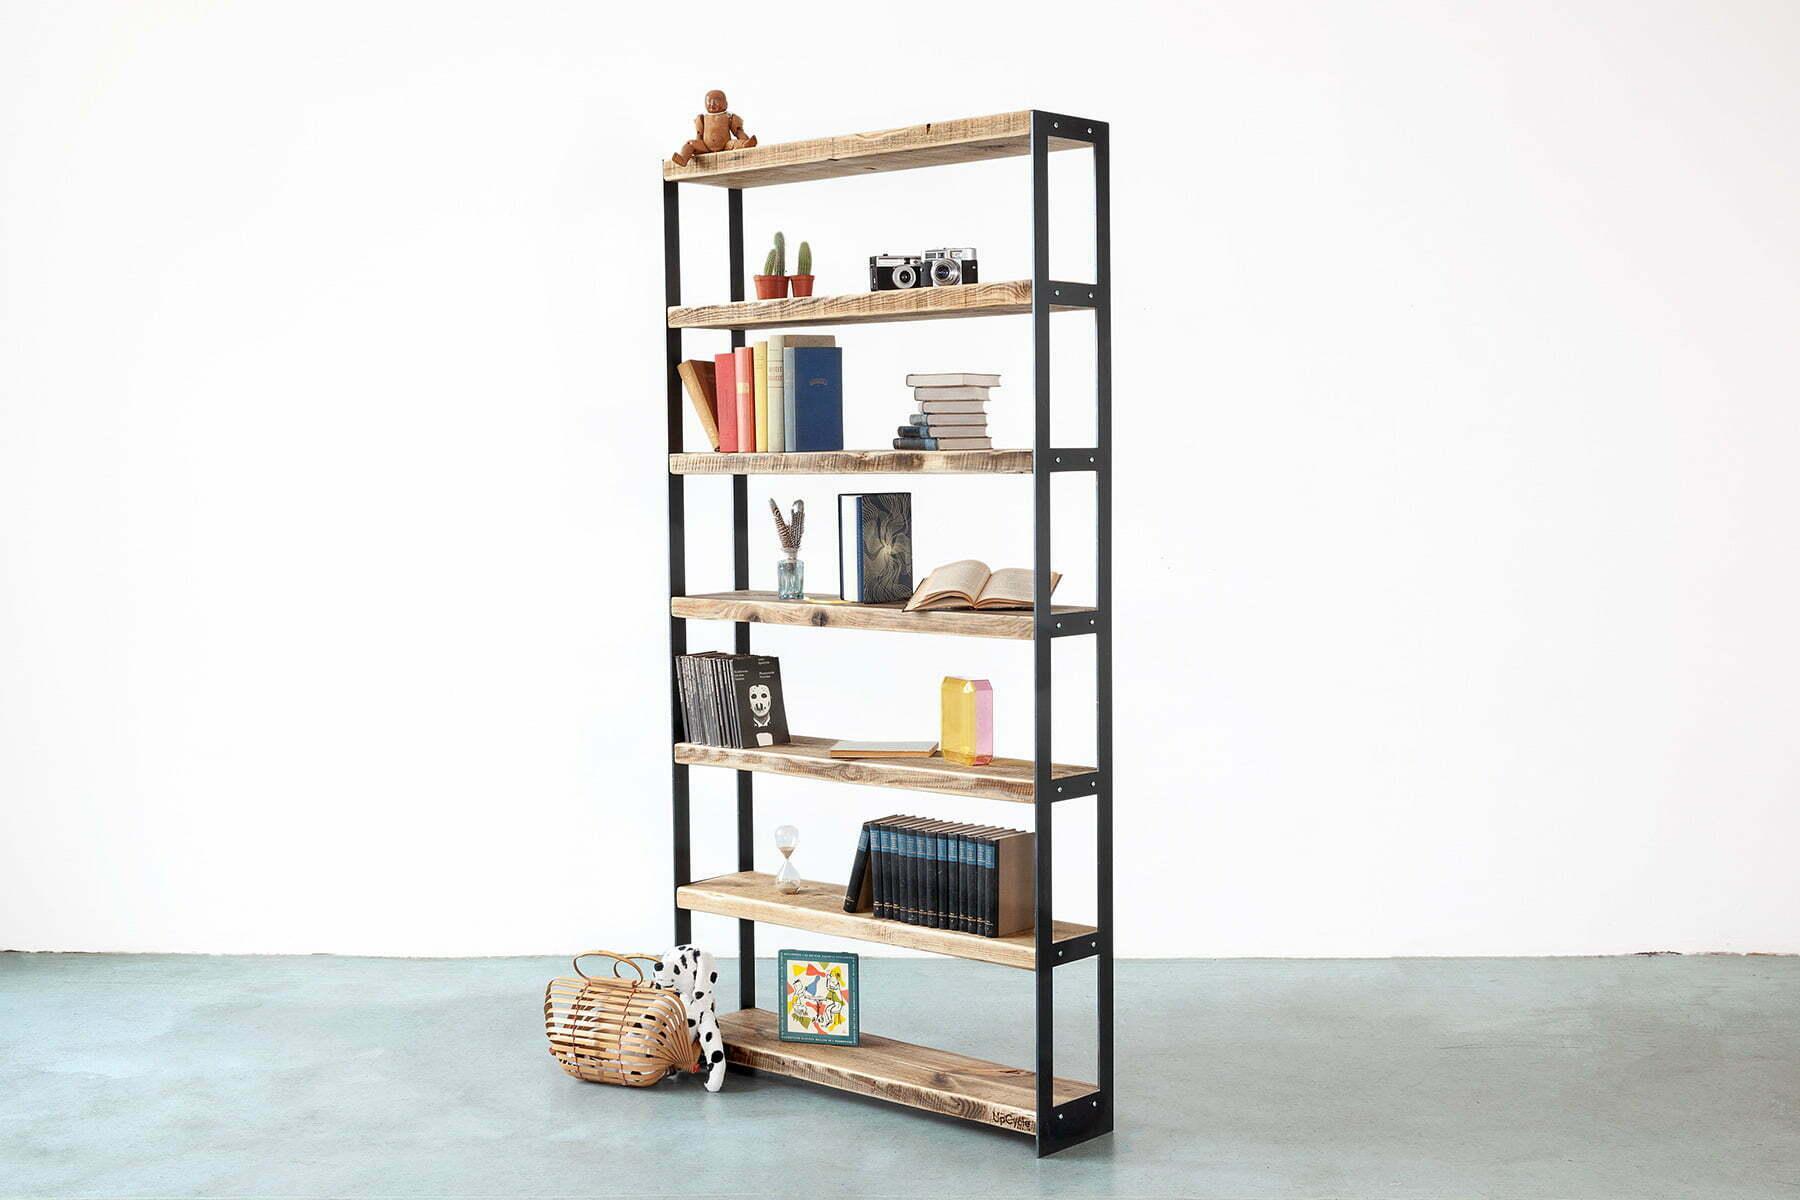 palindrom book upcycle berlin. Black Bedroom Furniture Sets. Home Design Ideas